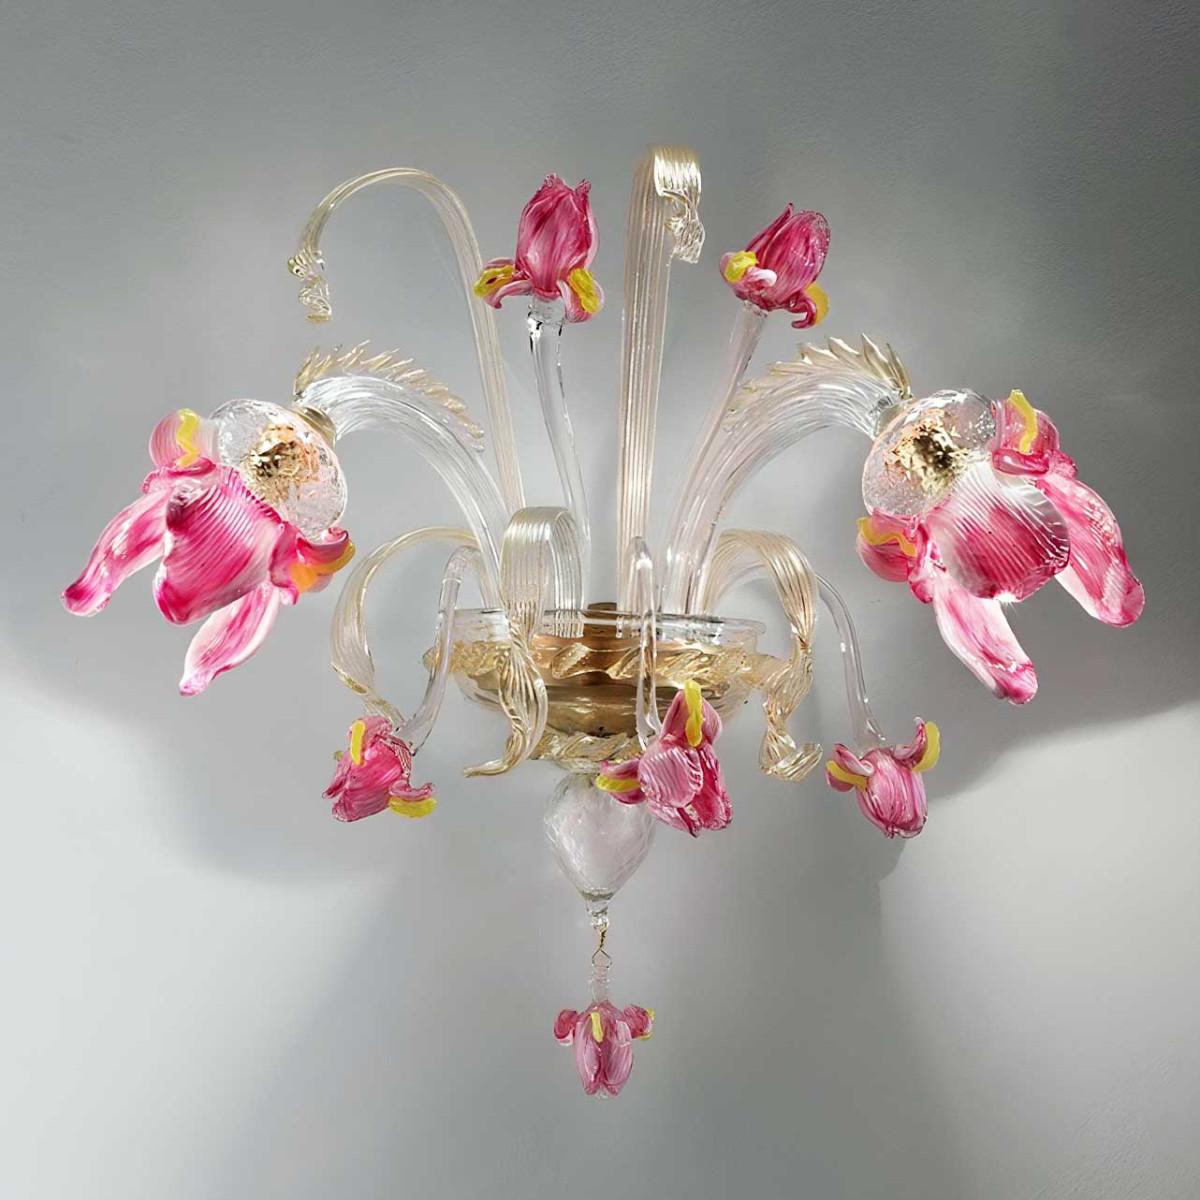 """Delizia"" 2 luces aplique en cristal de Murano flores rosadas"